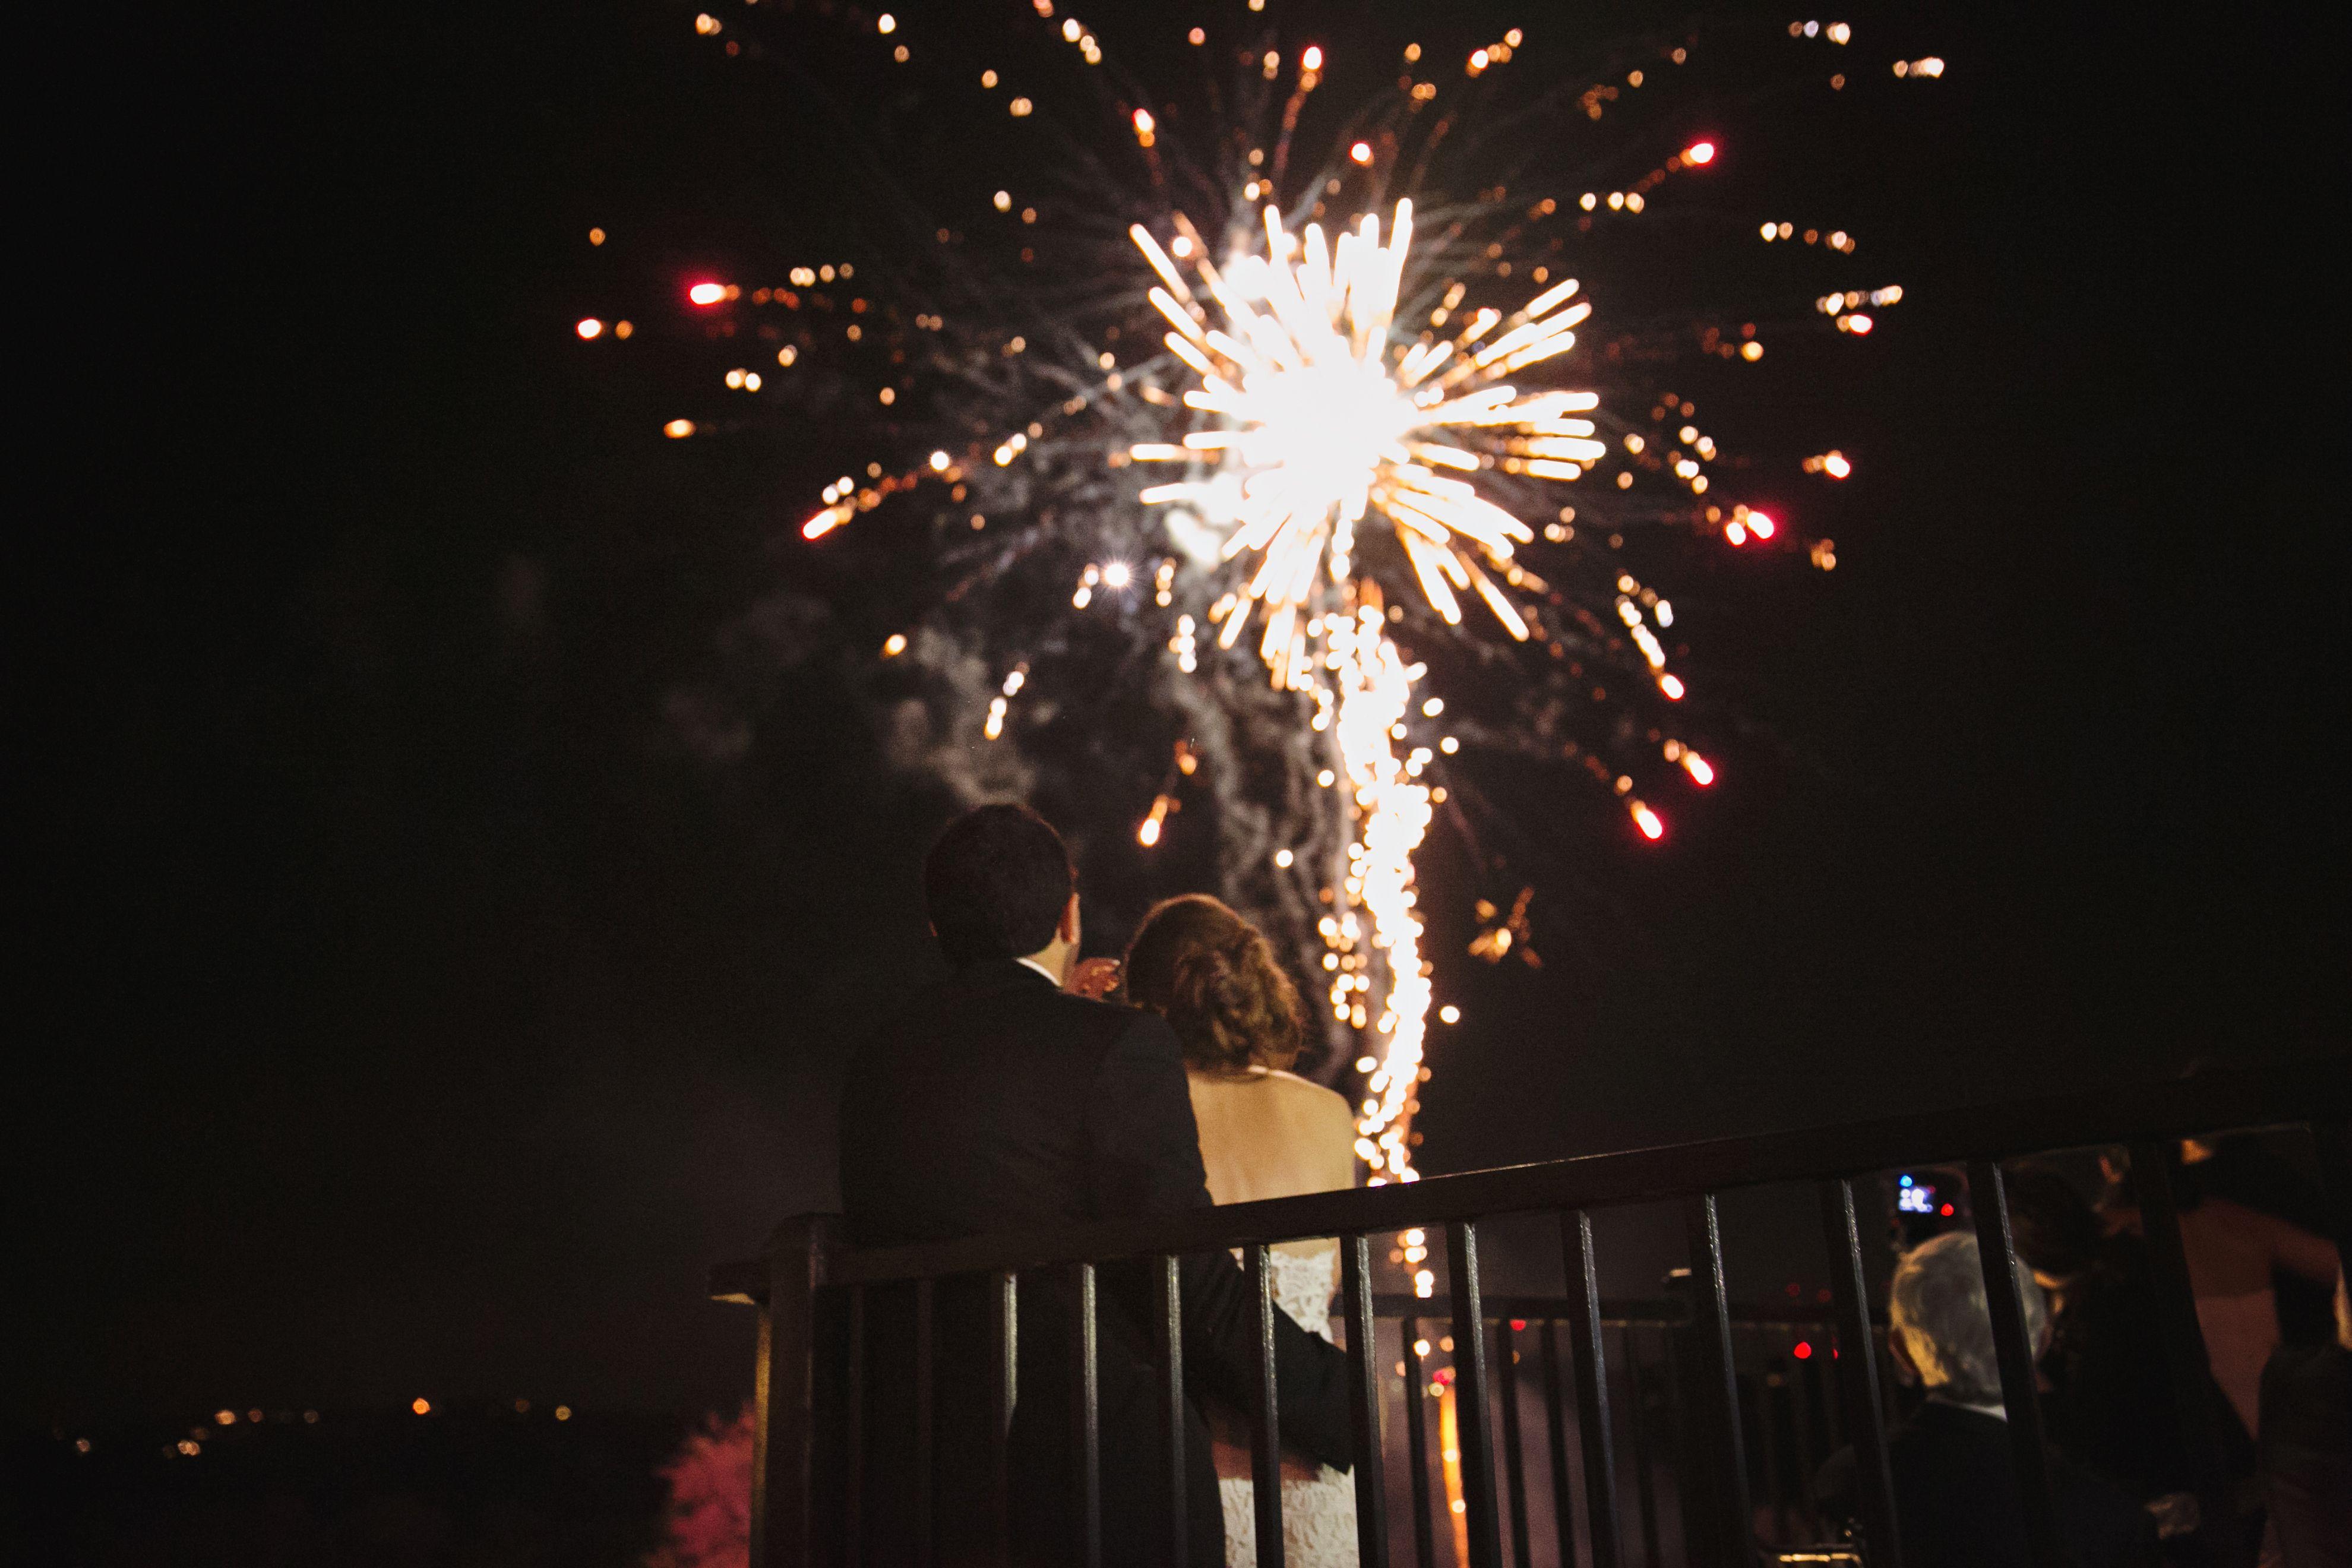 Fireworks Nour Abdul Reception And Ceremony At Barton Creek Resort Austin Tx Floral By Eventdesigner Photograp Fireworks Magical Memories Wedding